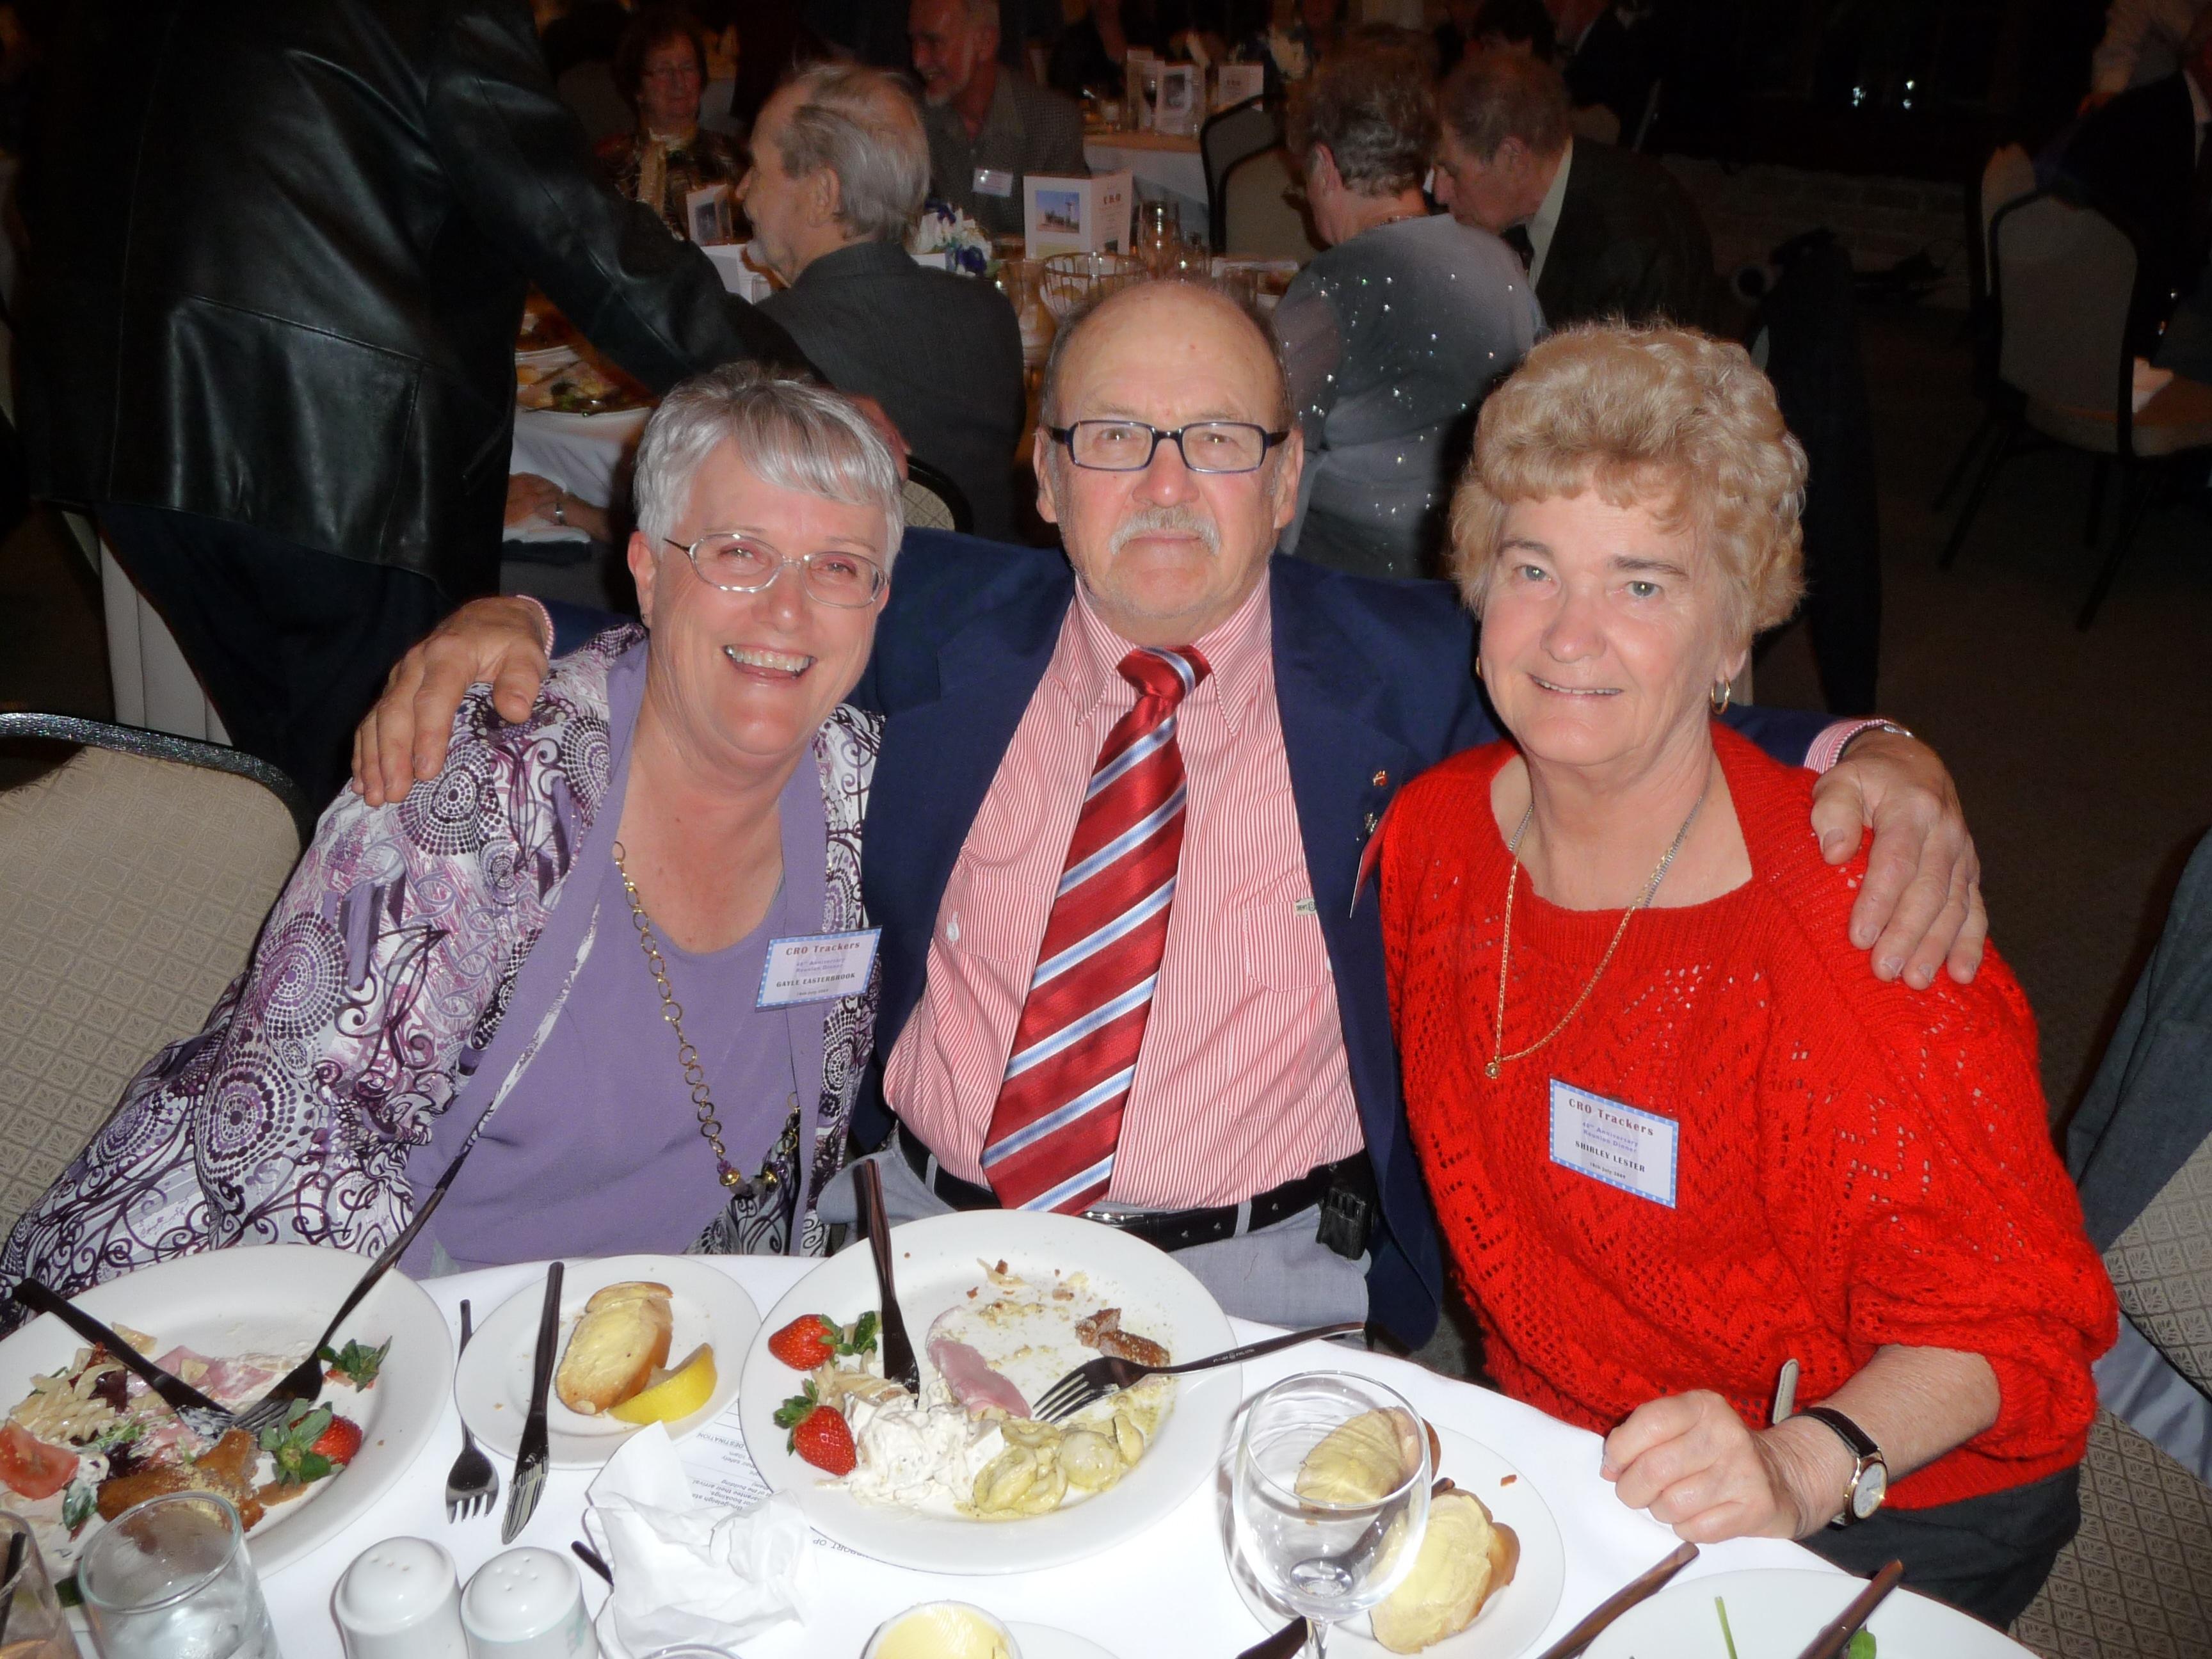 Gayle & John Easterbrook, Shirley Lester